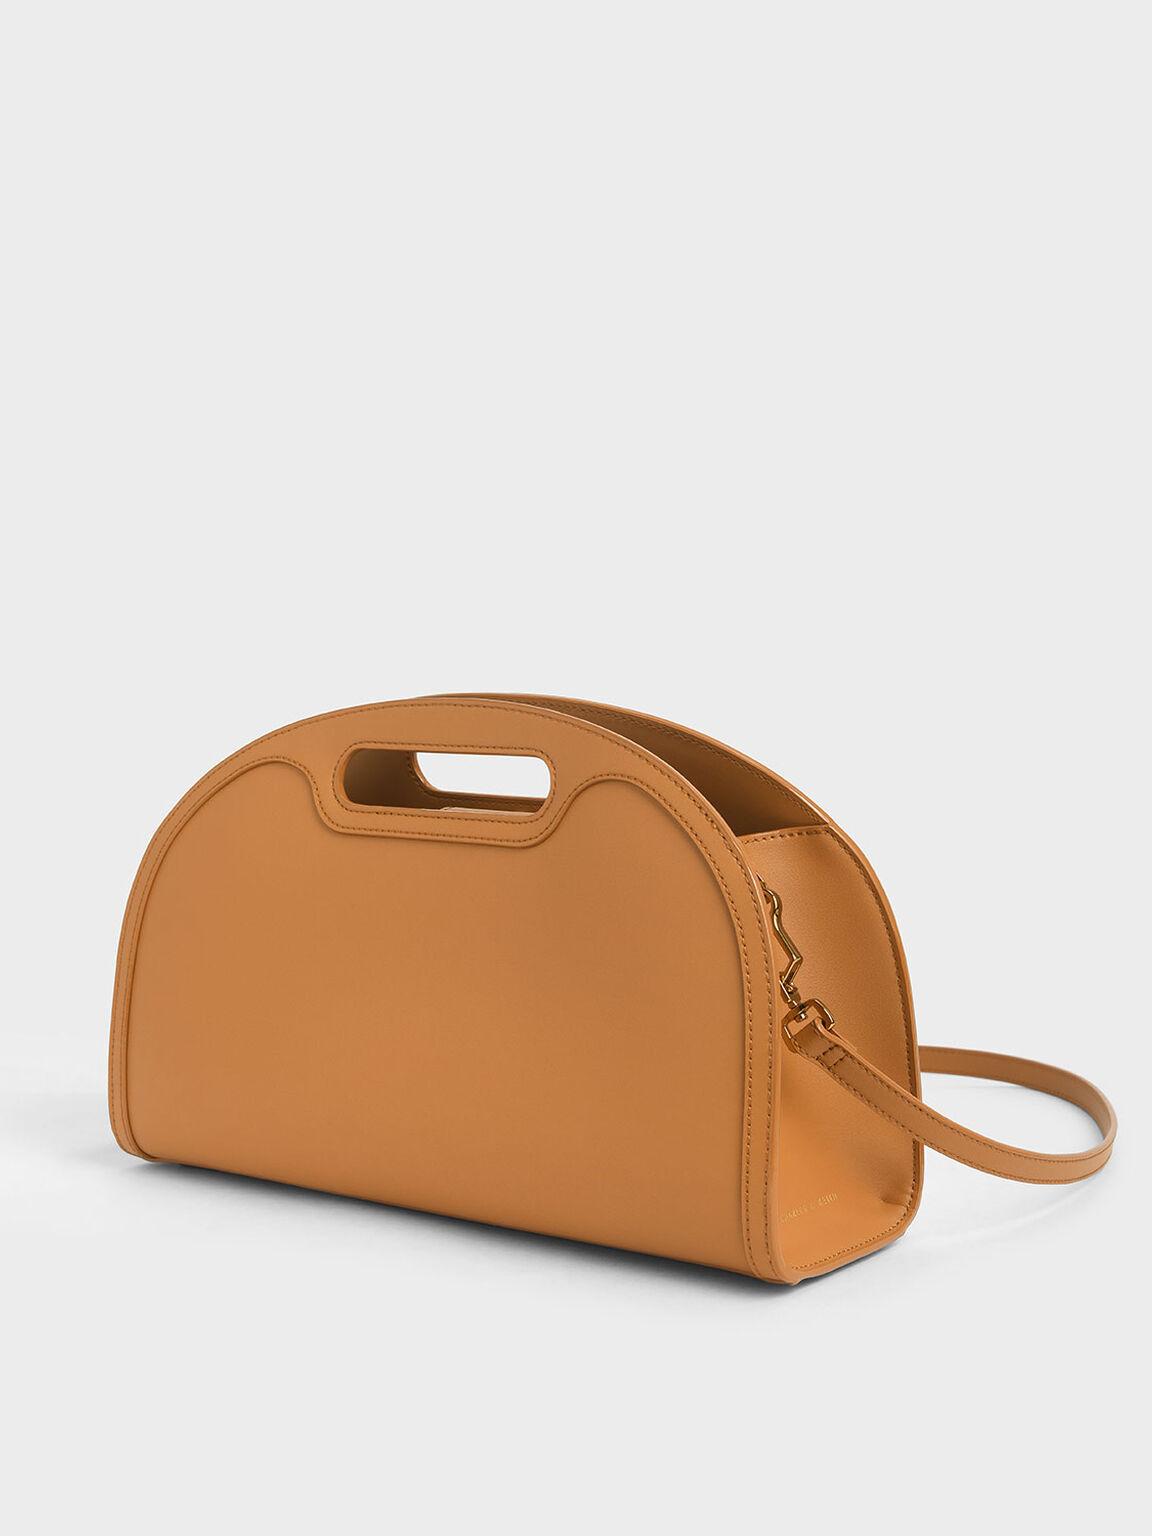 Elongated Tote Bag, Cognac, hi-res